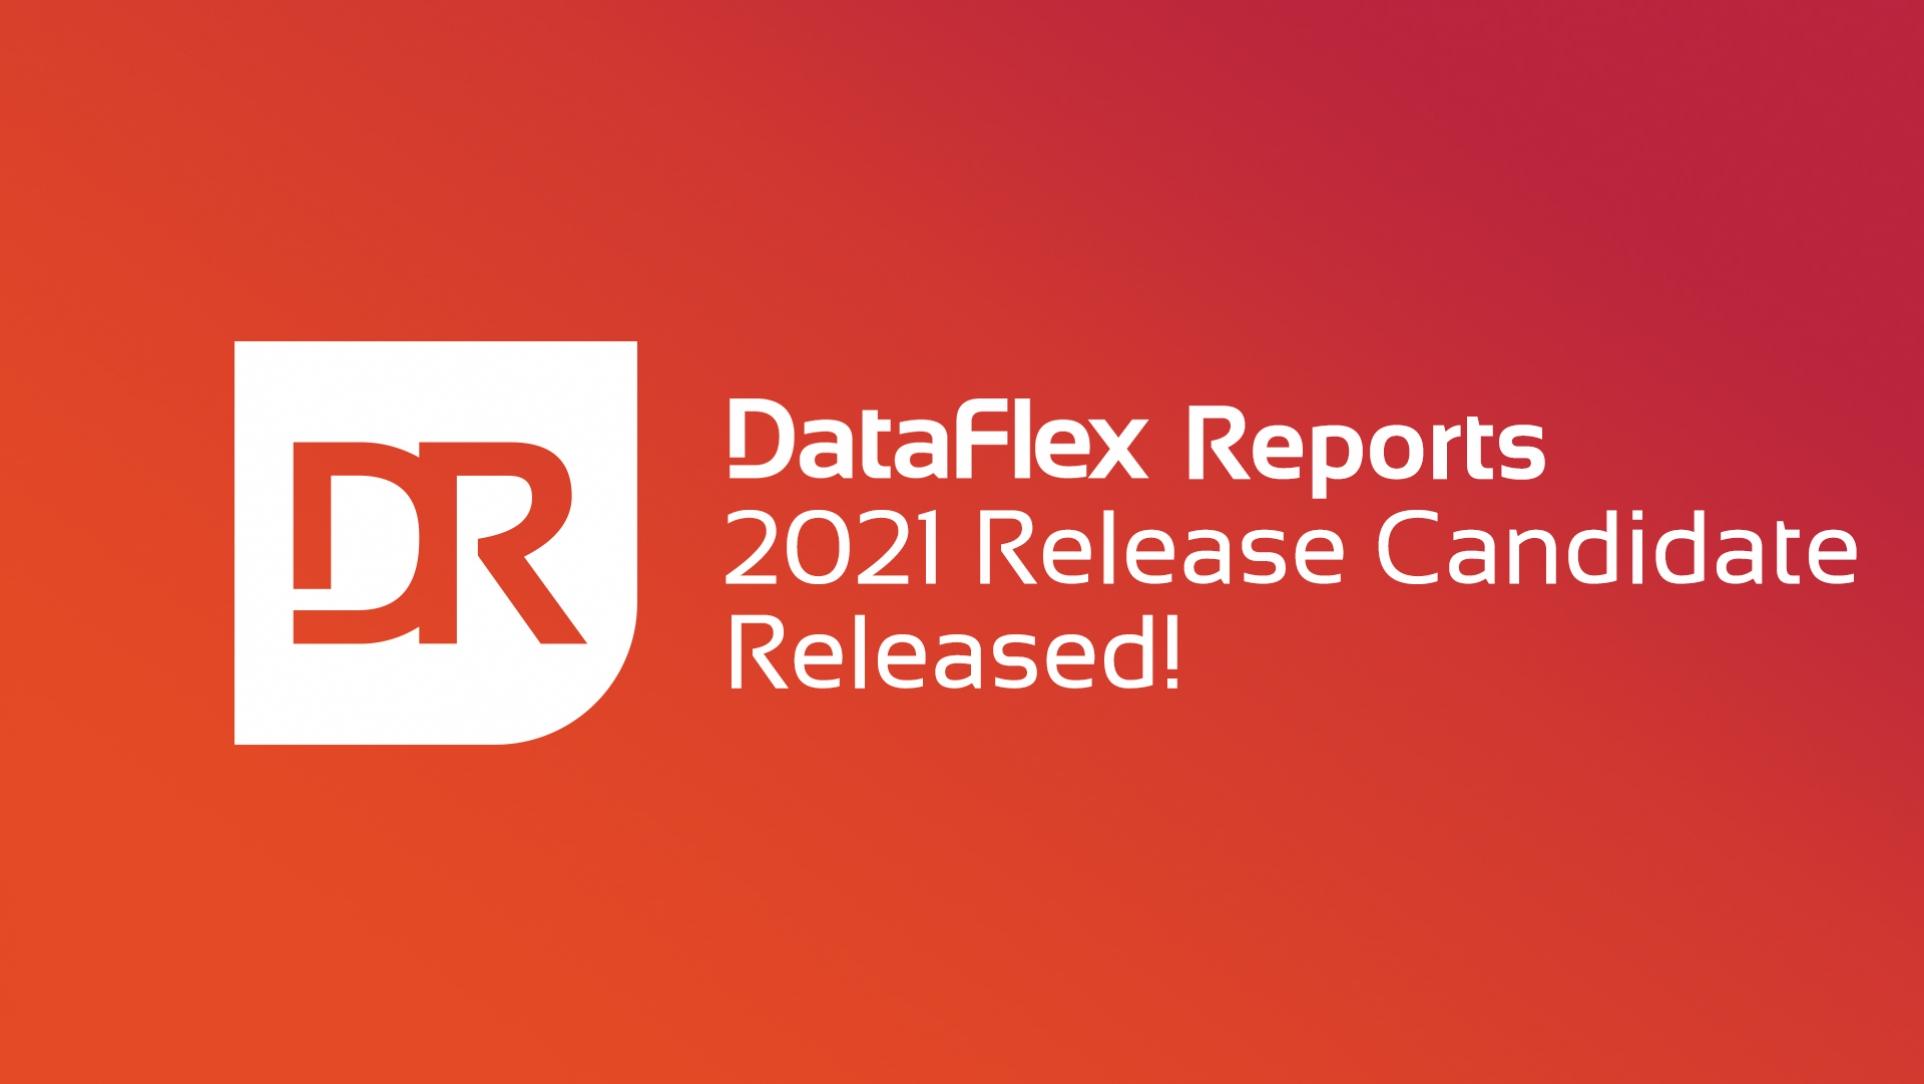 2021-02-22 DataFlex Reports Release Candidate